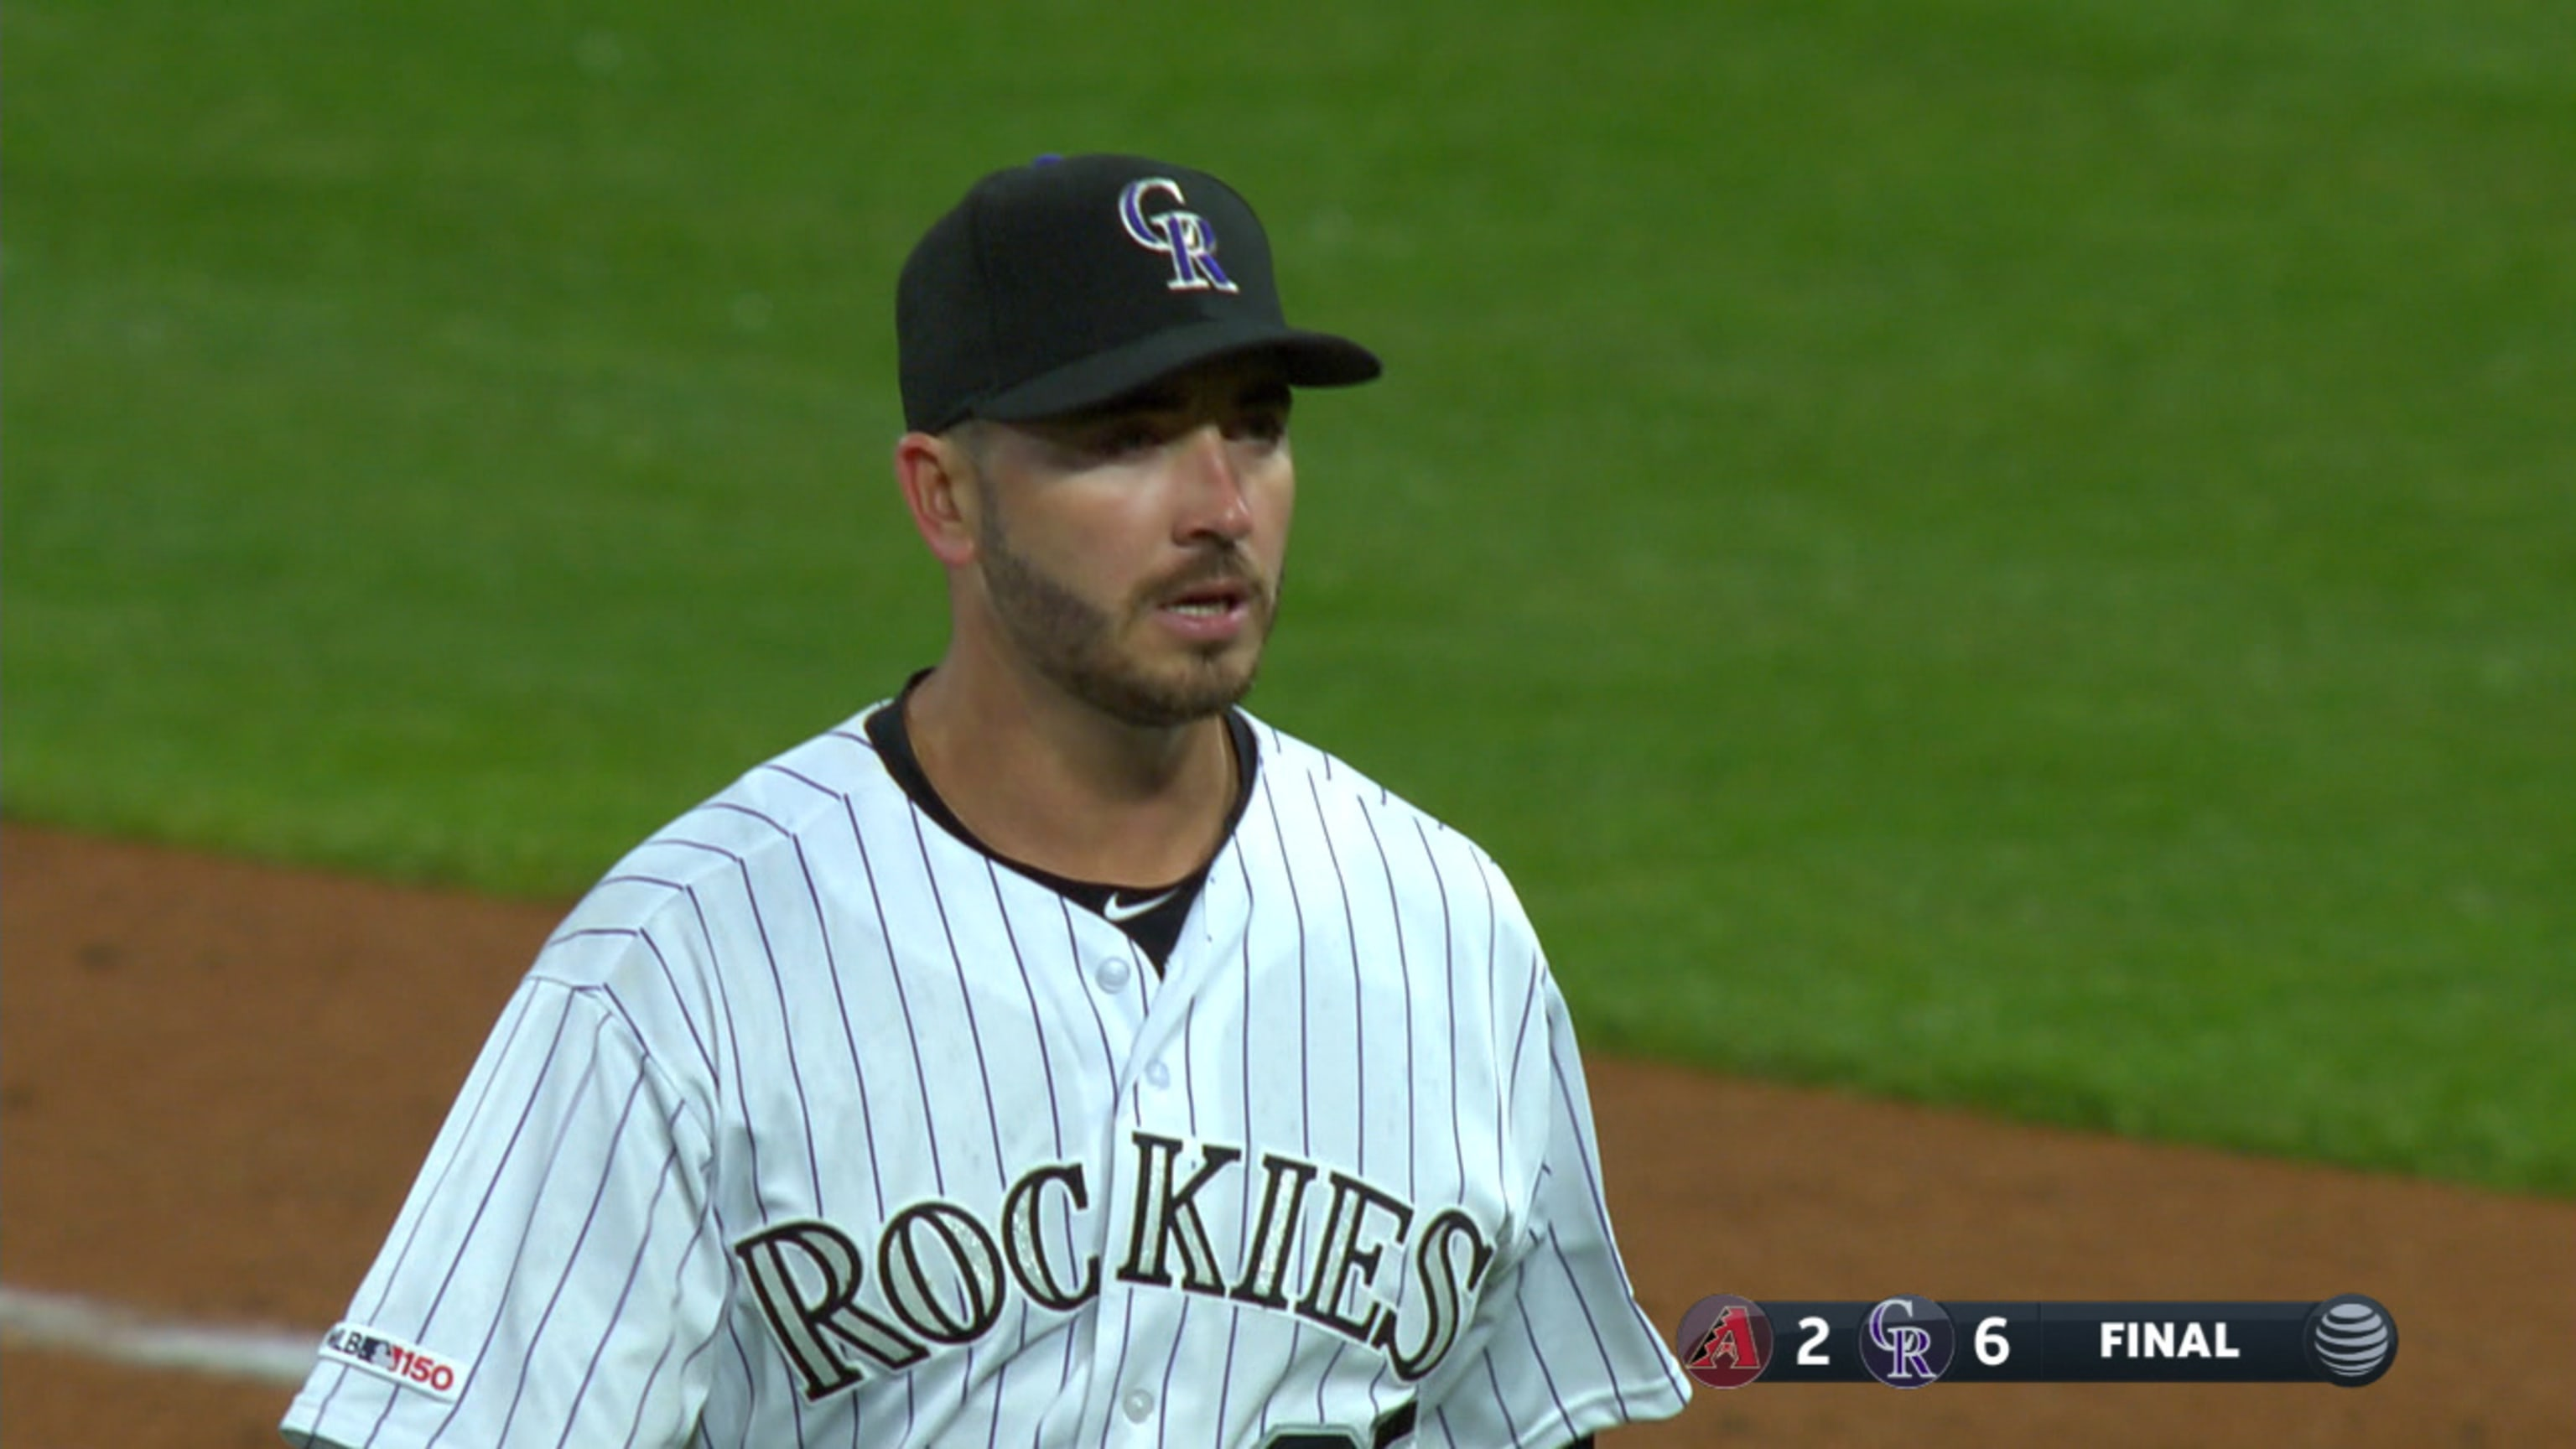 Chad Bettis Colorado Rockies Baseball Player Jersey